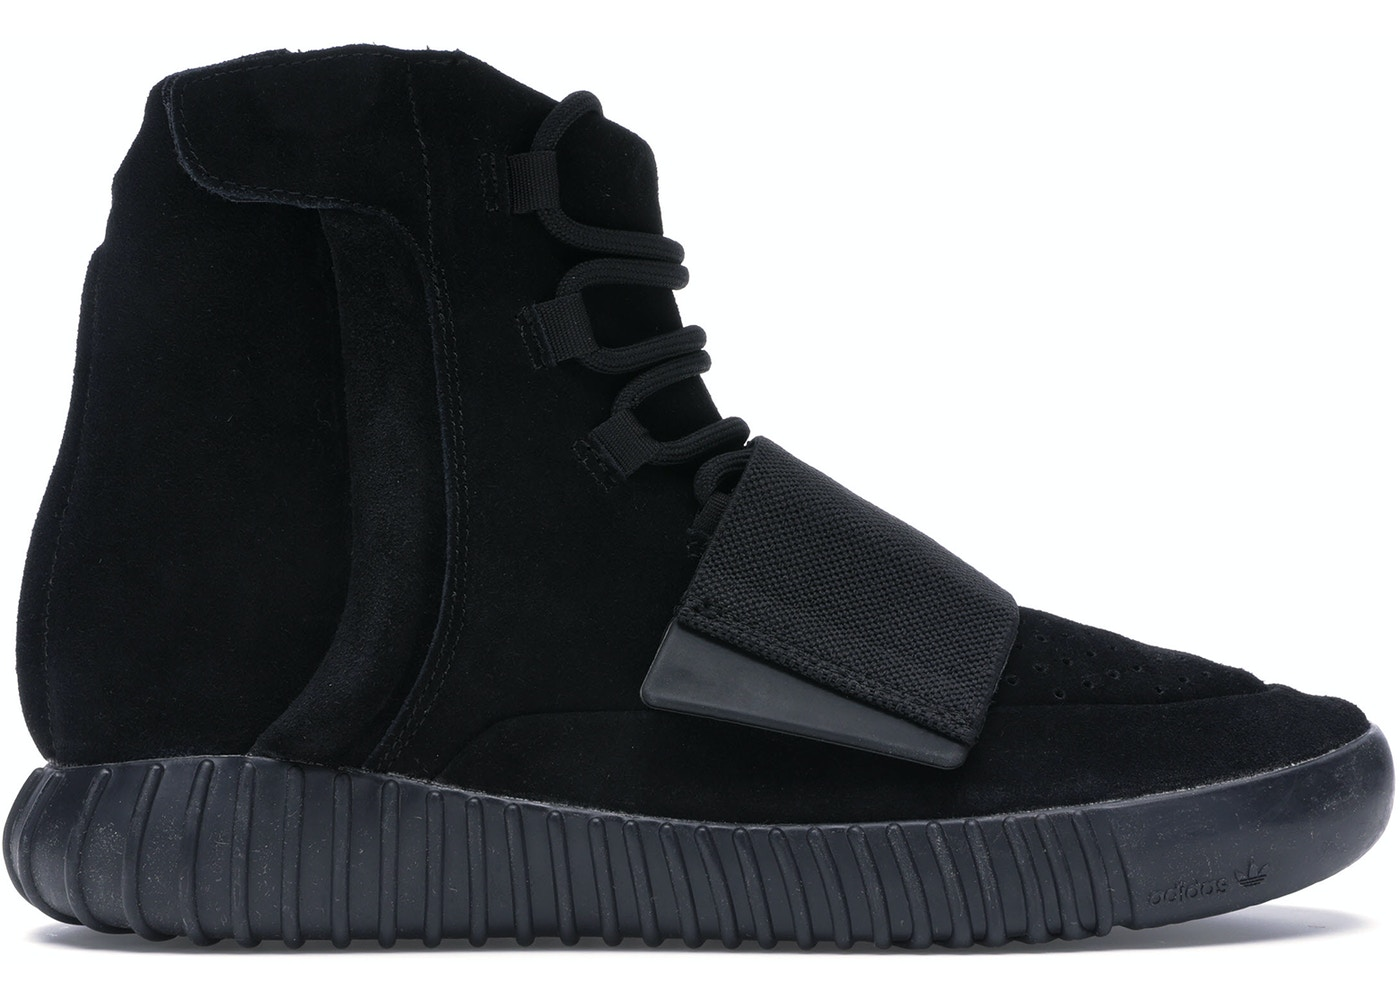 finest selection 61023 140ea adidas Yeezy Boost 750 Triple Black